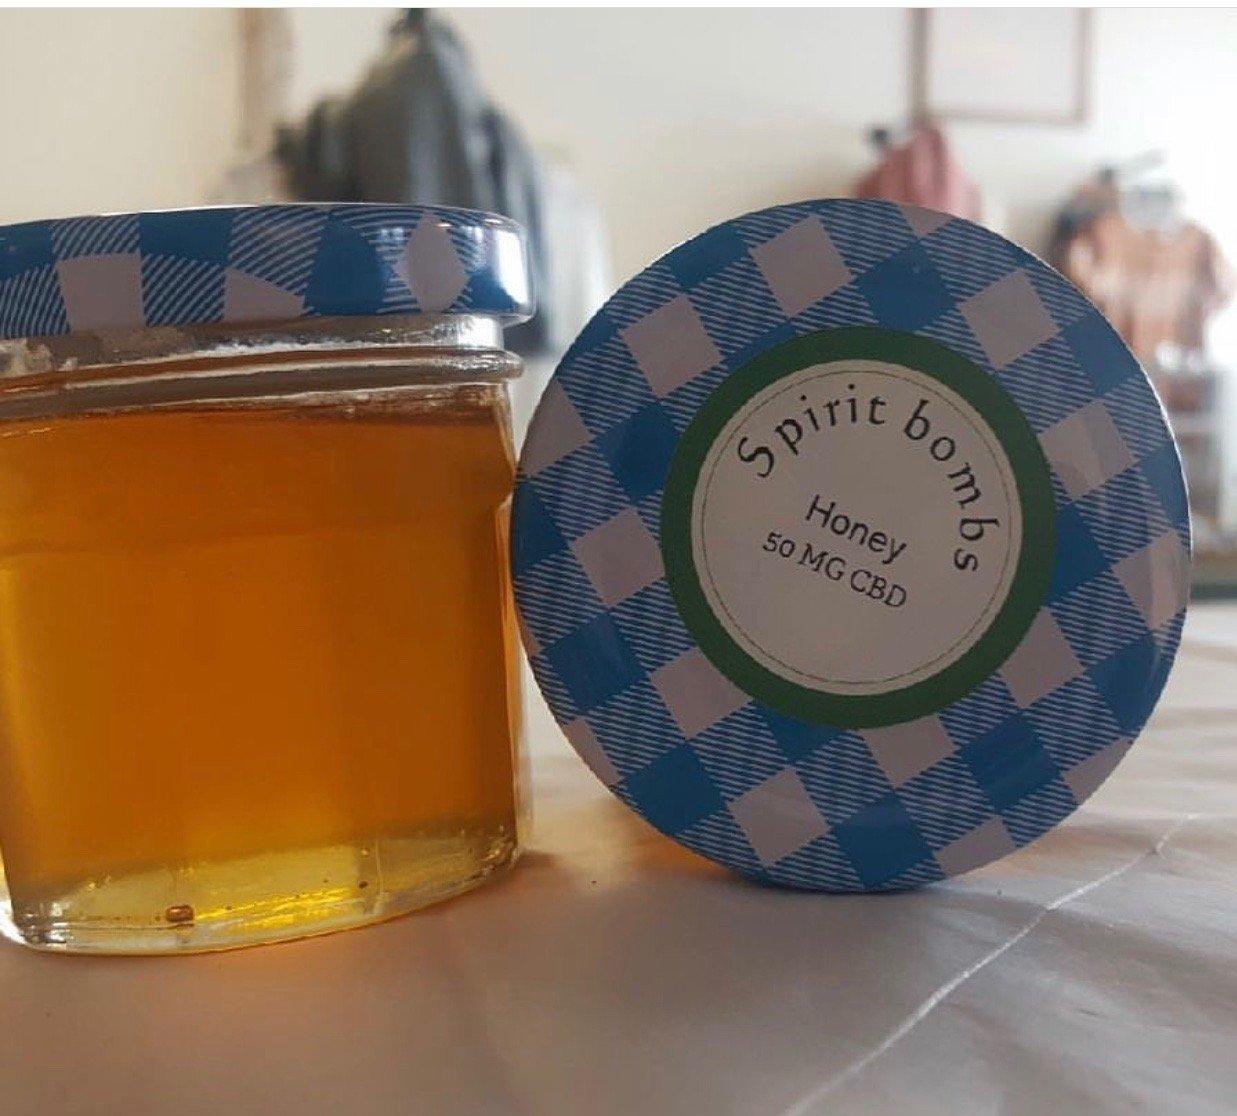 Image of 50MG CBD Honey 4oz jar